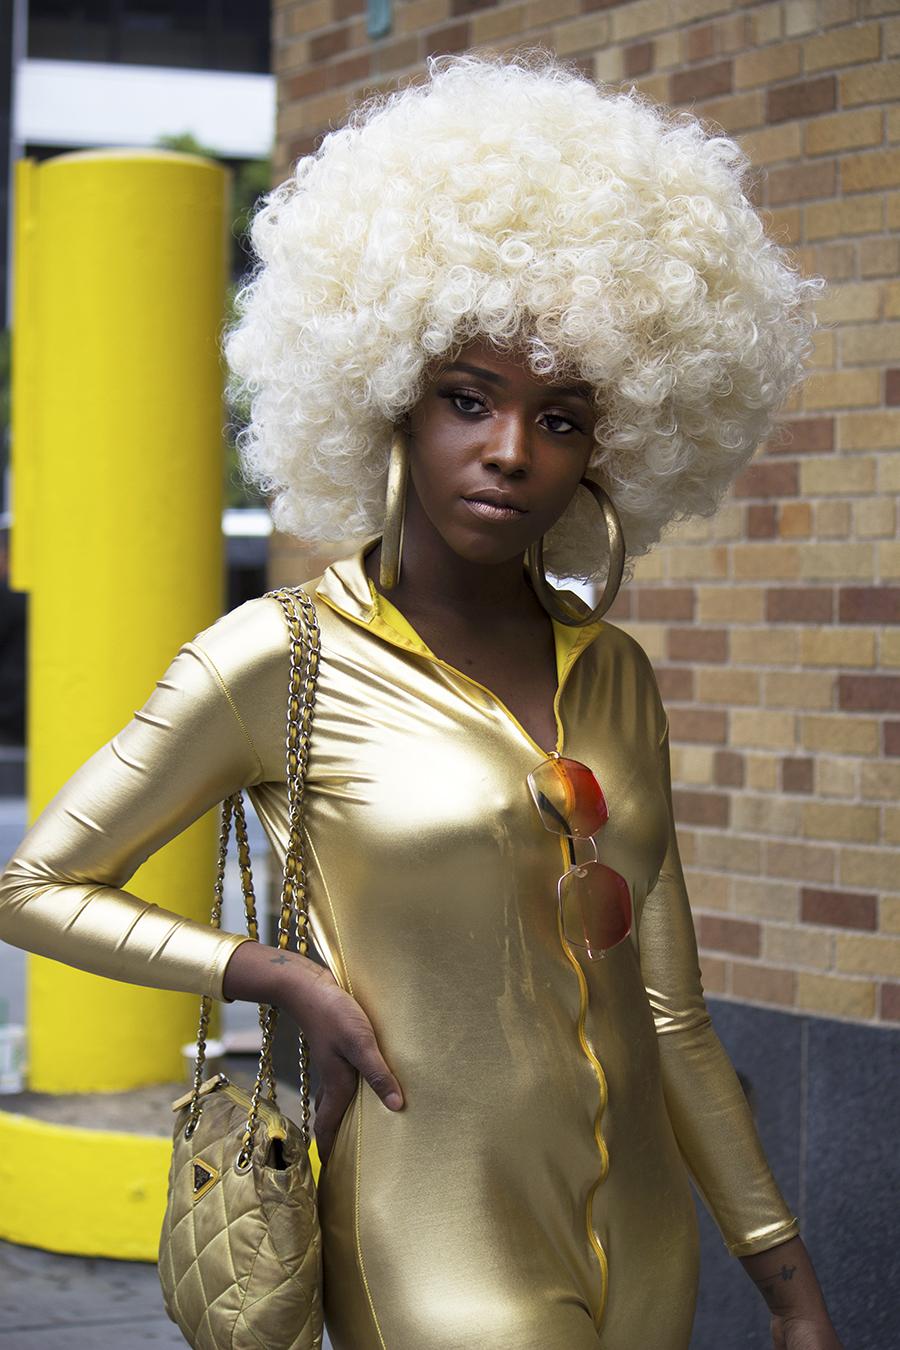 Sharon_Song_New_york_fashion_week_blond_afro_wig_Tony_Ward_Studio